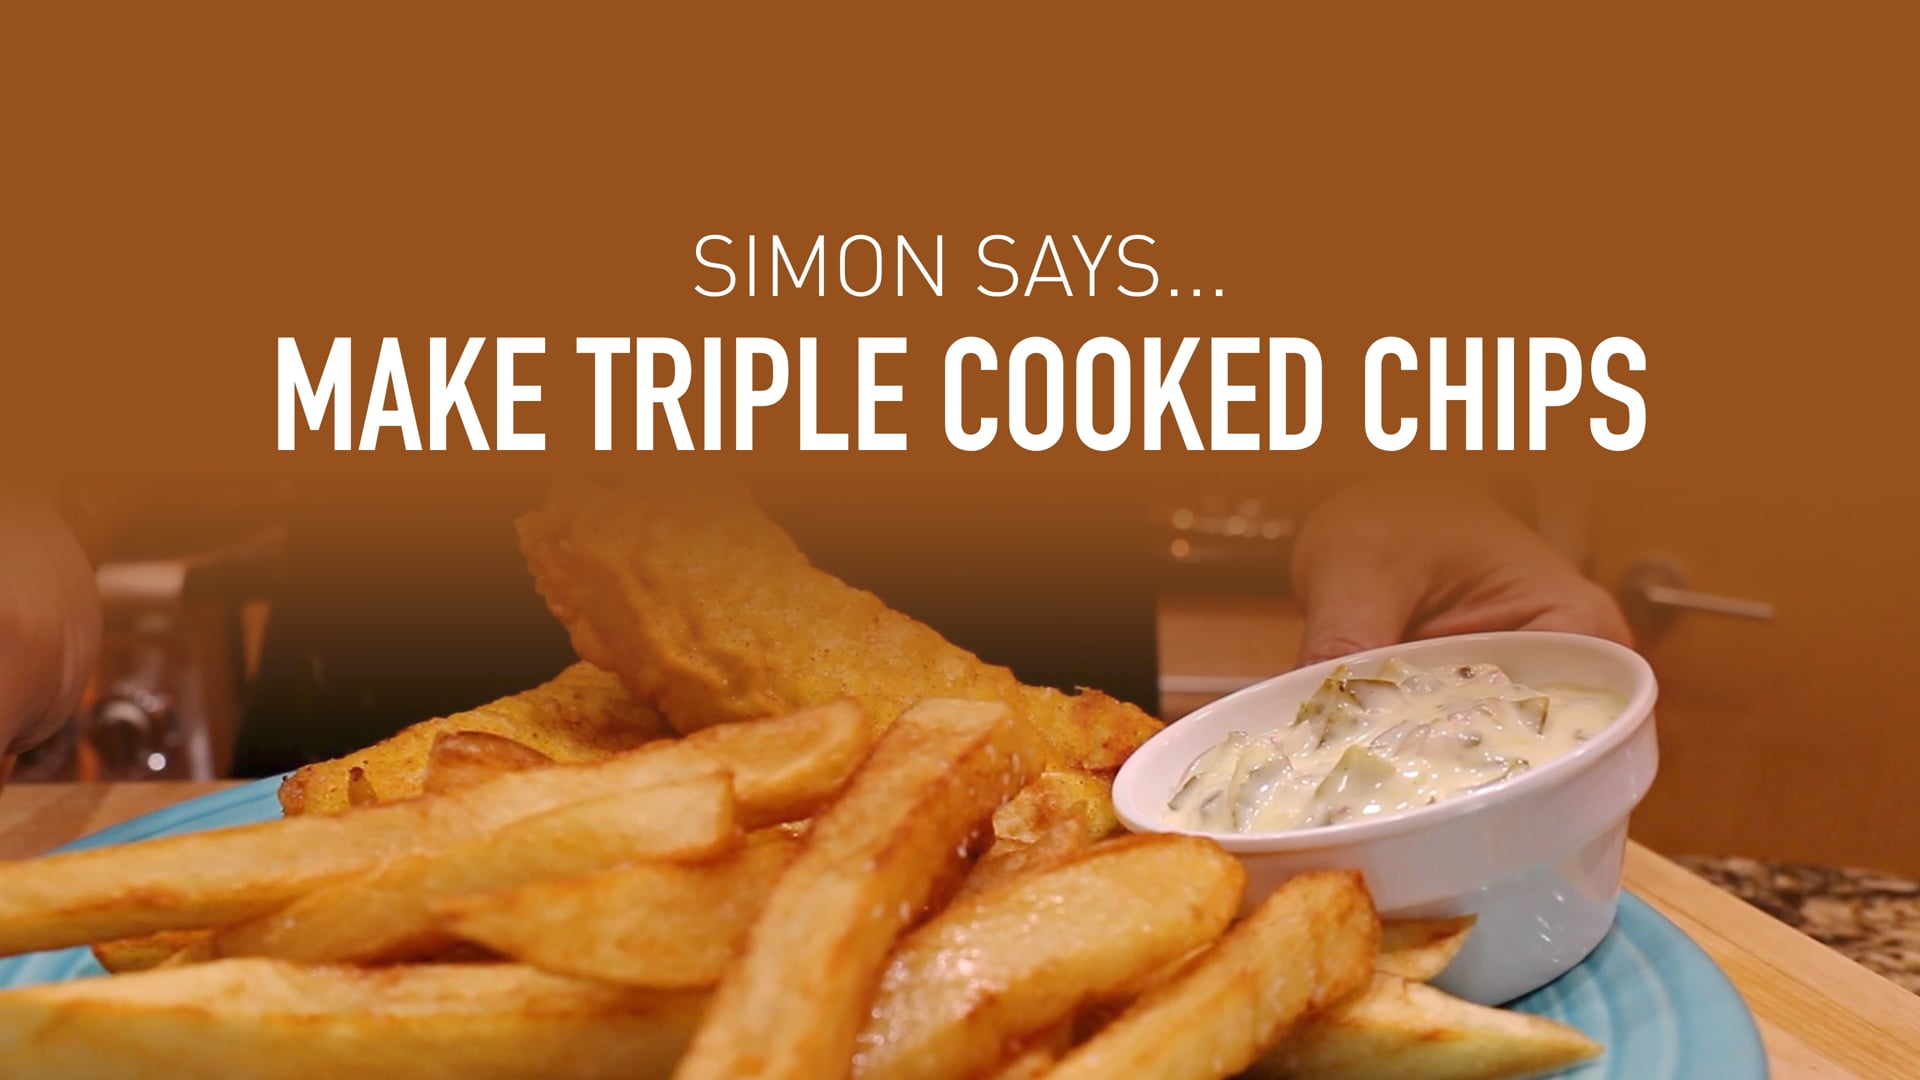 Simon Says... Make Triple Cooked Chips